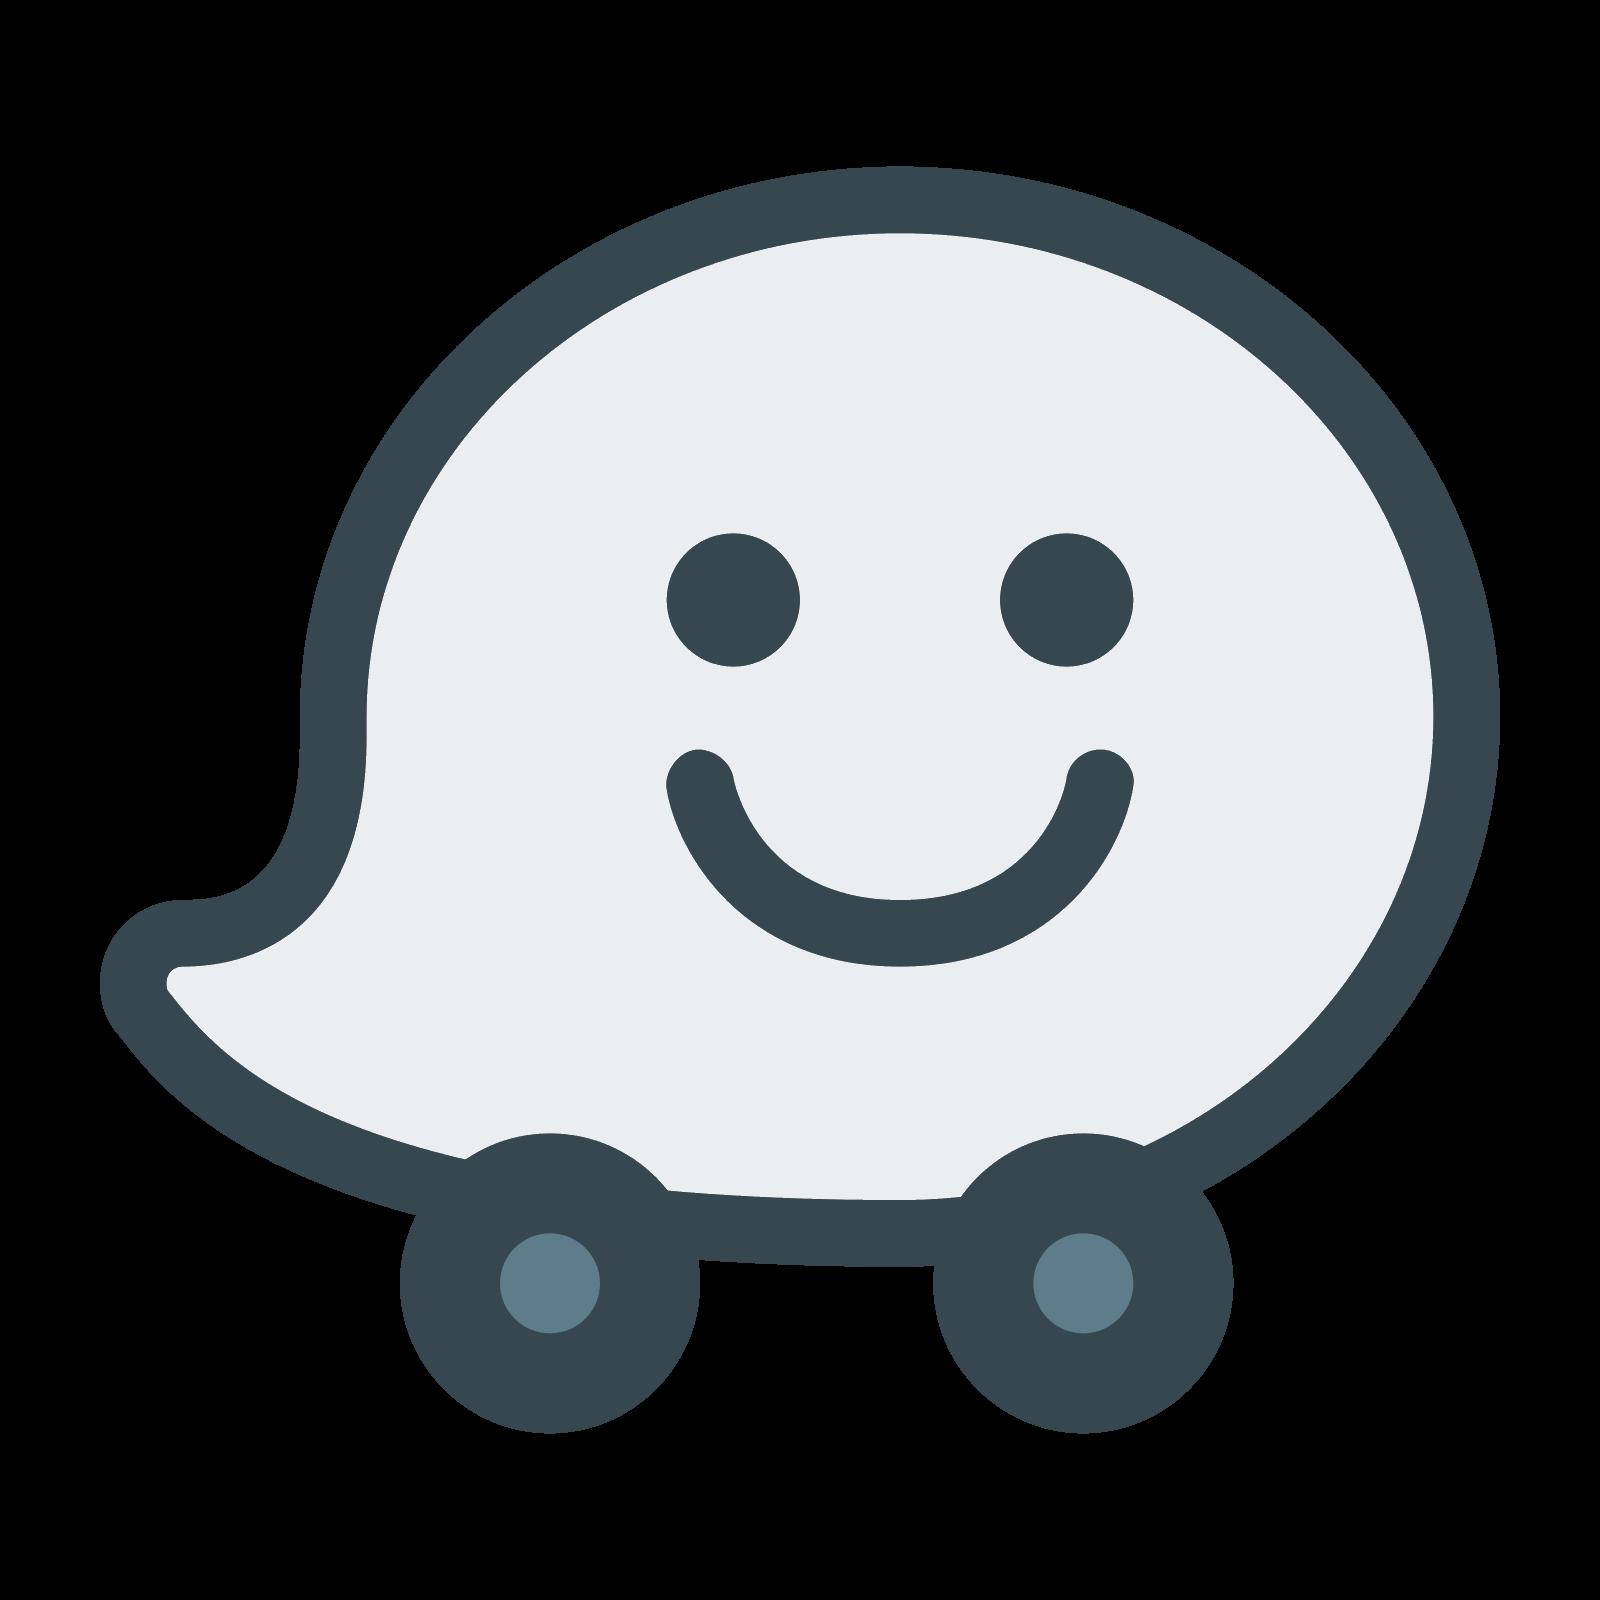 Waze PNG imagens para download gratuito - Crazy Png-Png imagens ...